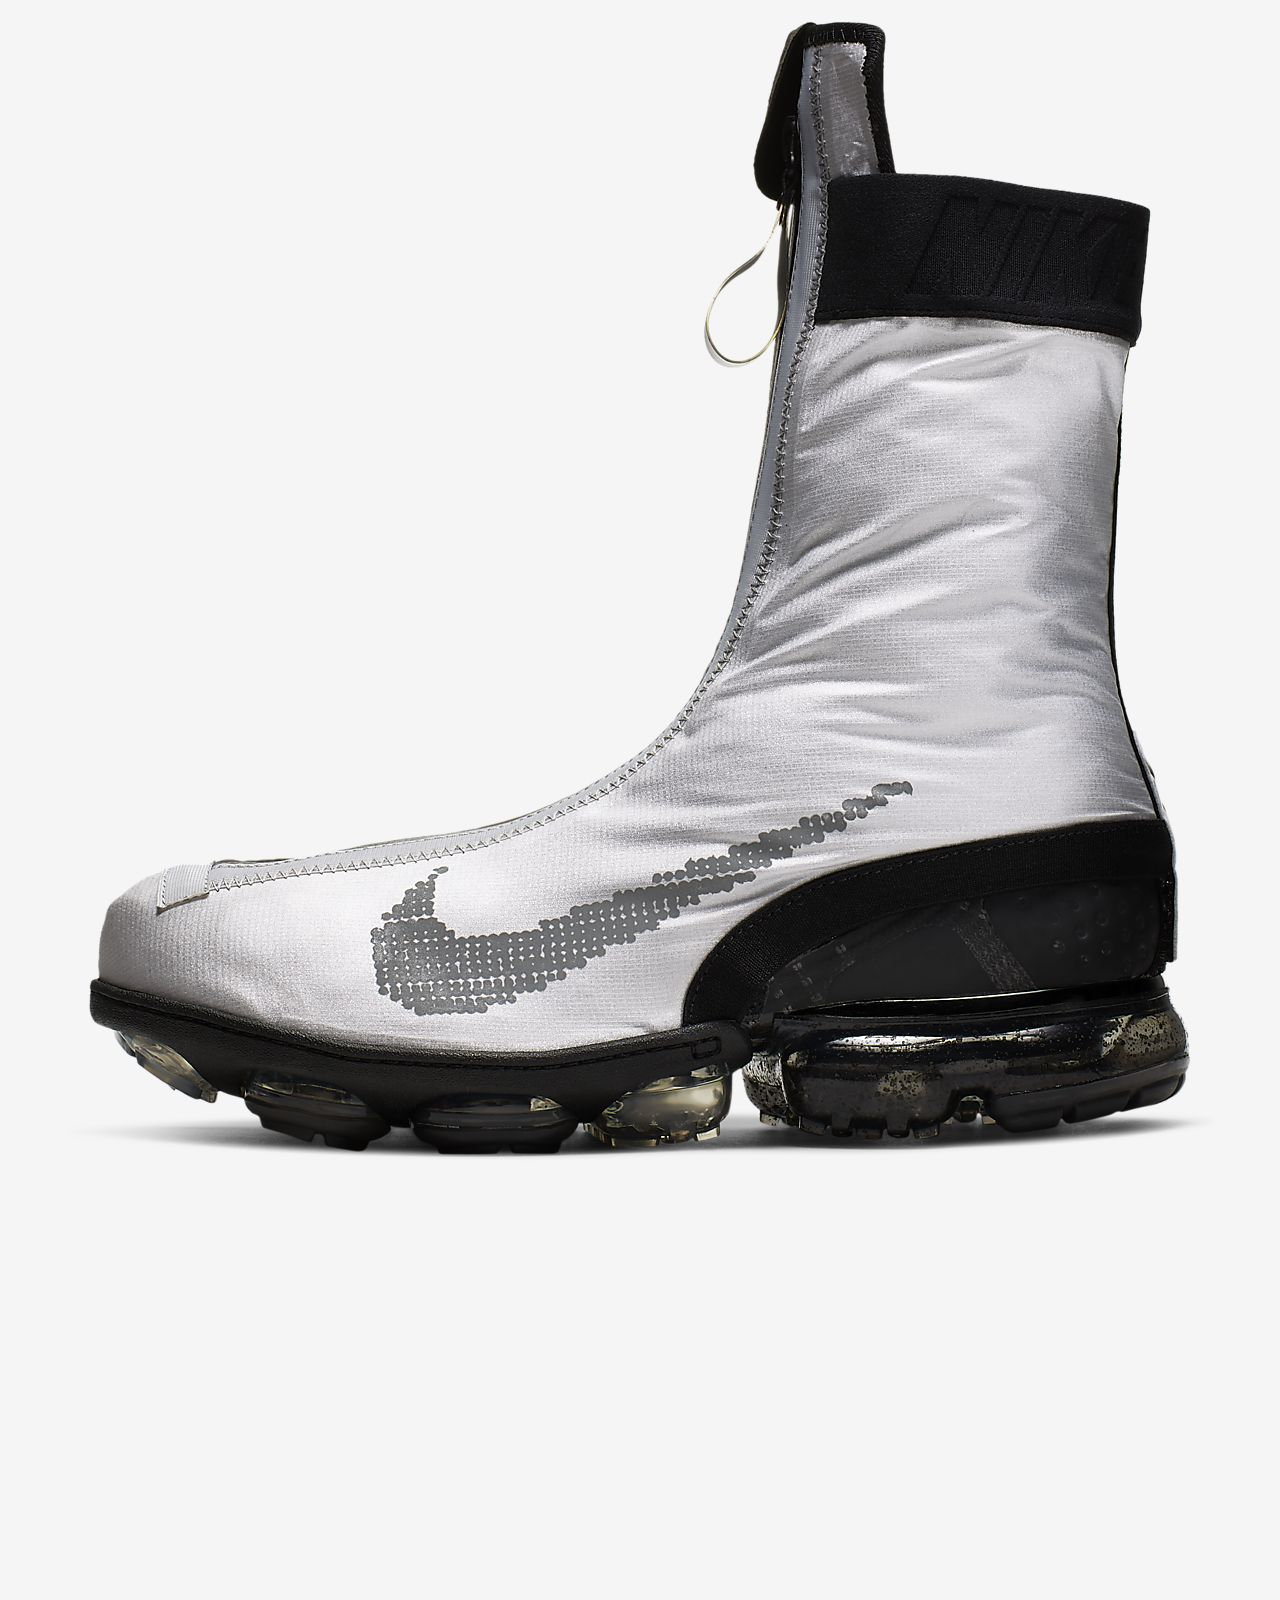 Nike Air VaporMax FlyKnit Gaiter ISPA sko